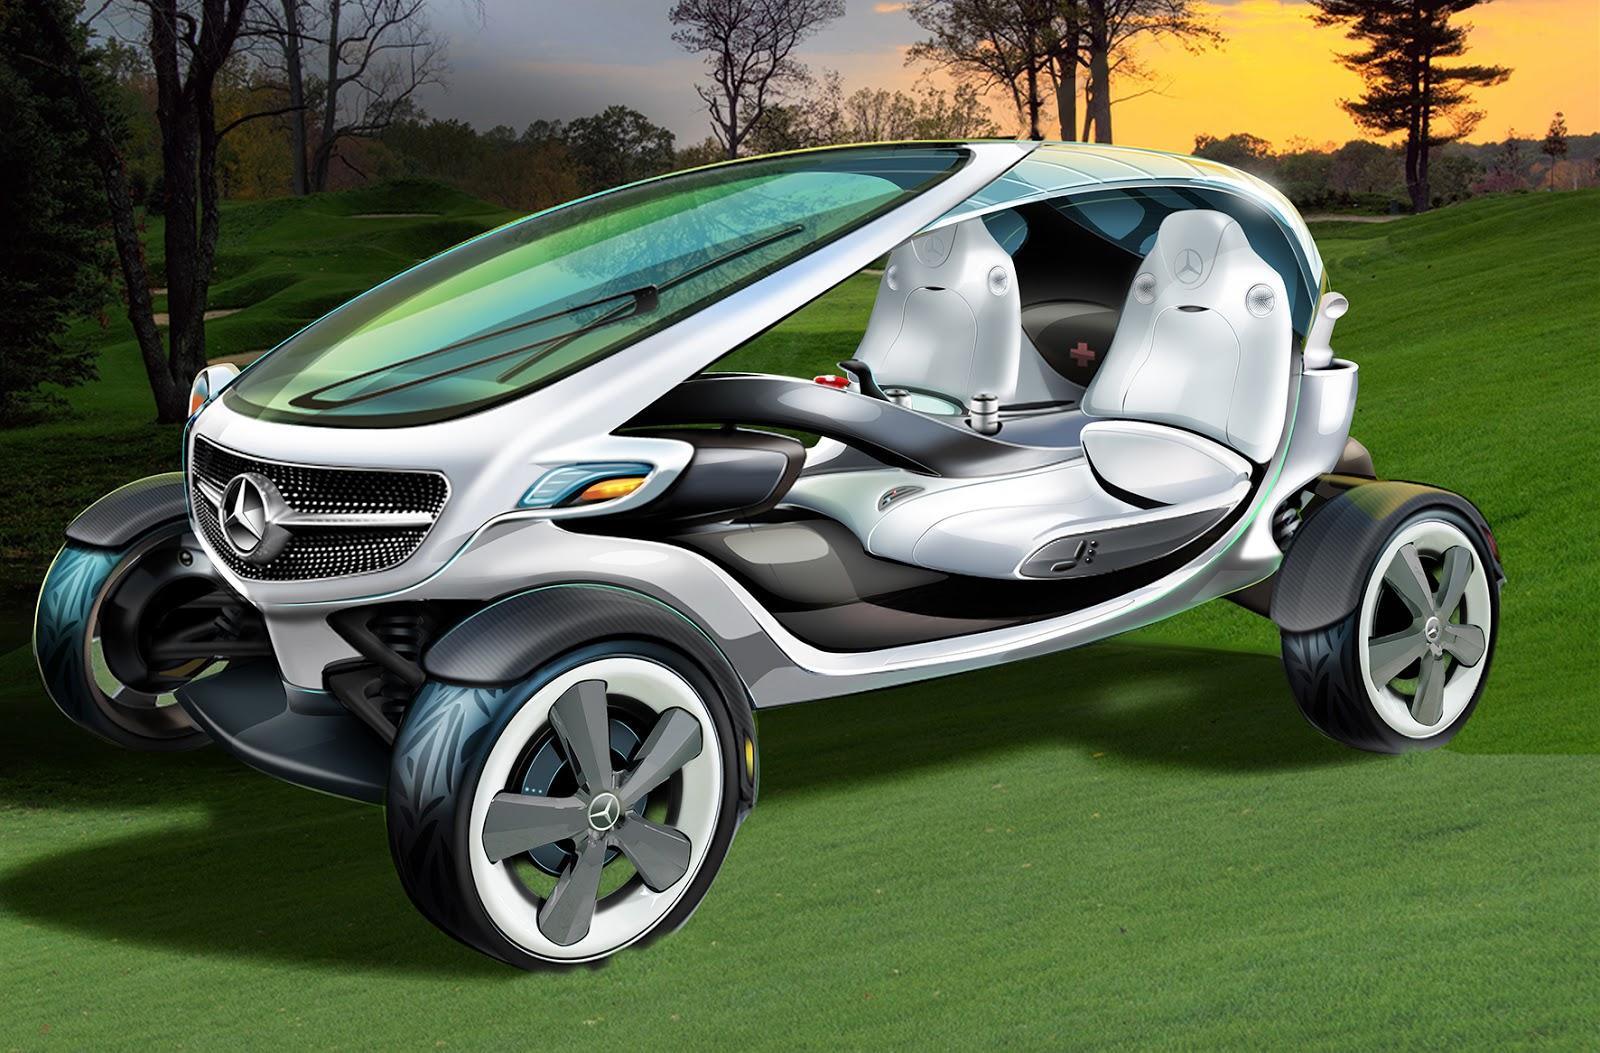 Mercedes-Benz unveil Hub Motor Powered Vision Golf Cart | Electric on maserati golf cart, harley davidson golf cart, 8 seater golf cart, ferrari golf cart, ducati golf cart, hummer golf cart, convert to gas golf cart, lamborghini golf cart, john deere golf cart, yanmar golf cart, ac golf cart, dodge ram golf cart, camaro golf cart, audi golf cart, custom golf cart, ford think golf cart, d&d golf cart, bentley golf cart, big rig golf cart, cadillac golf cart,